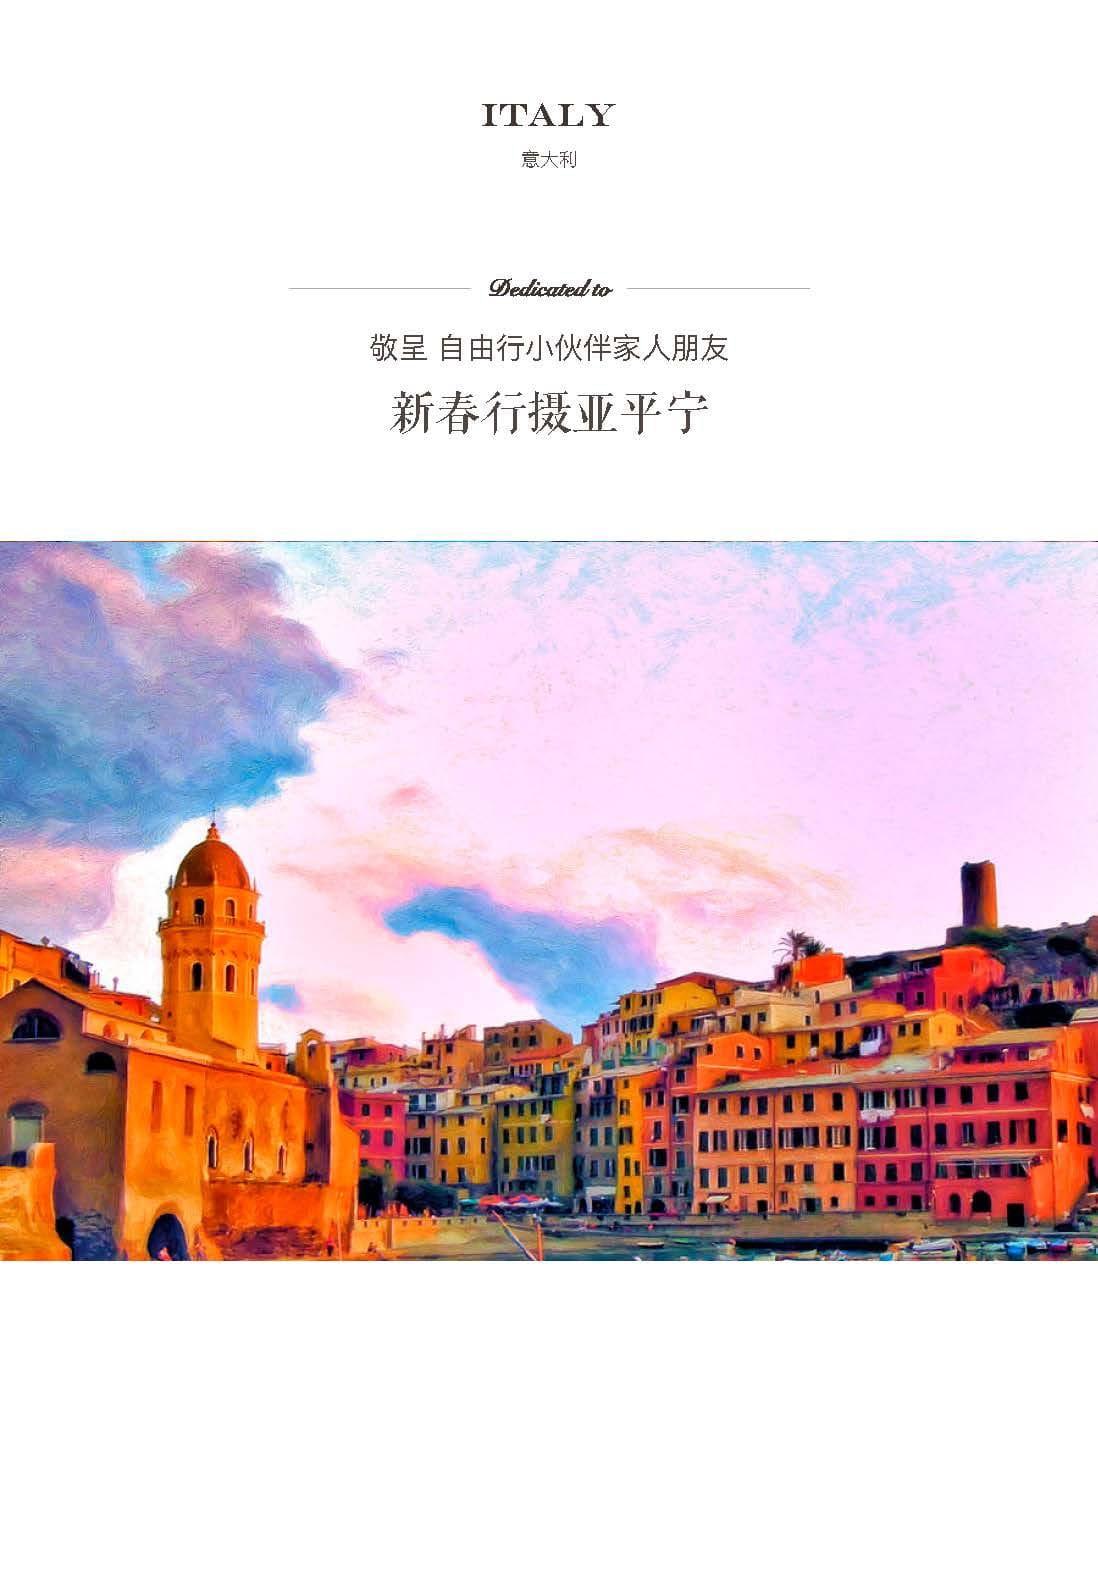 Pic book